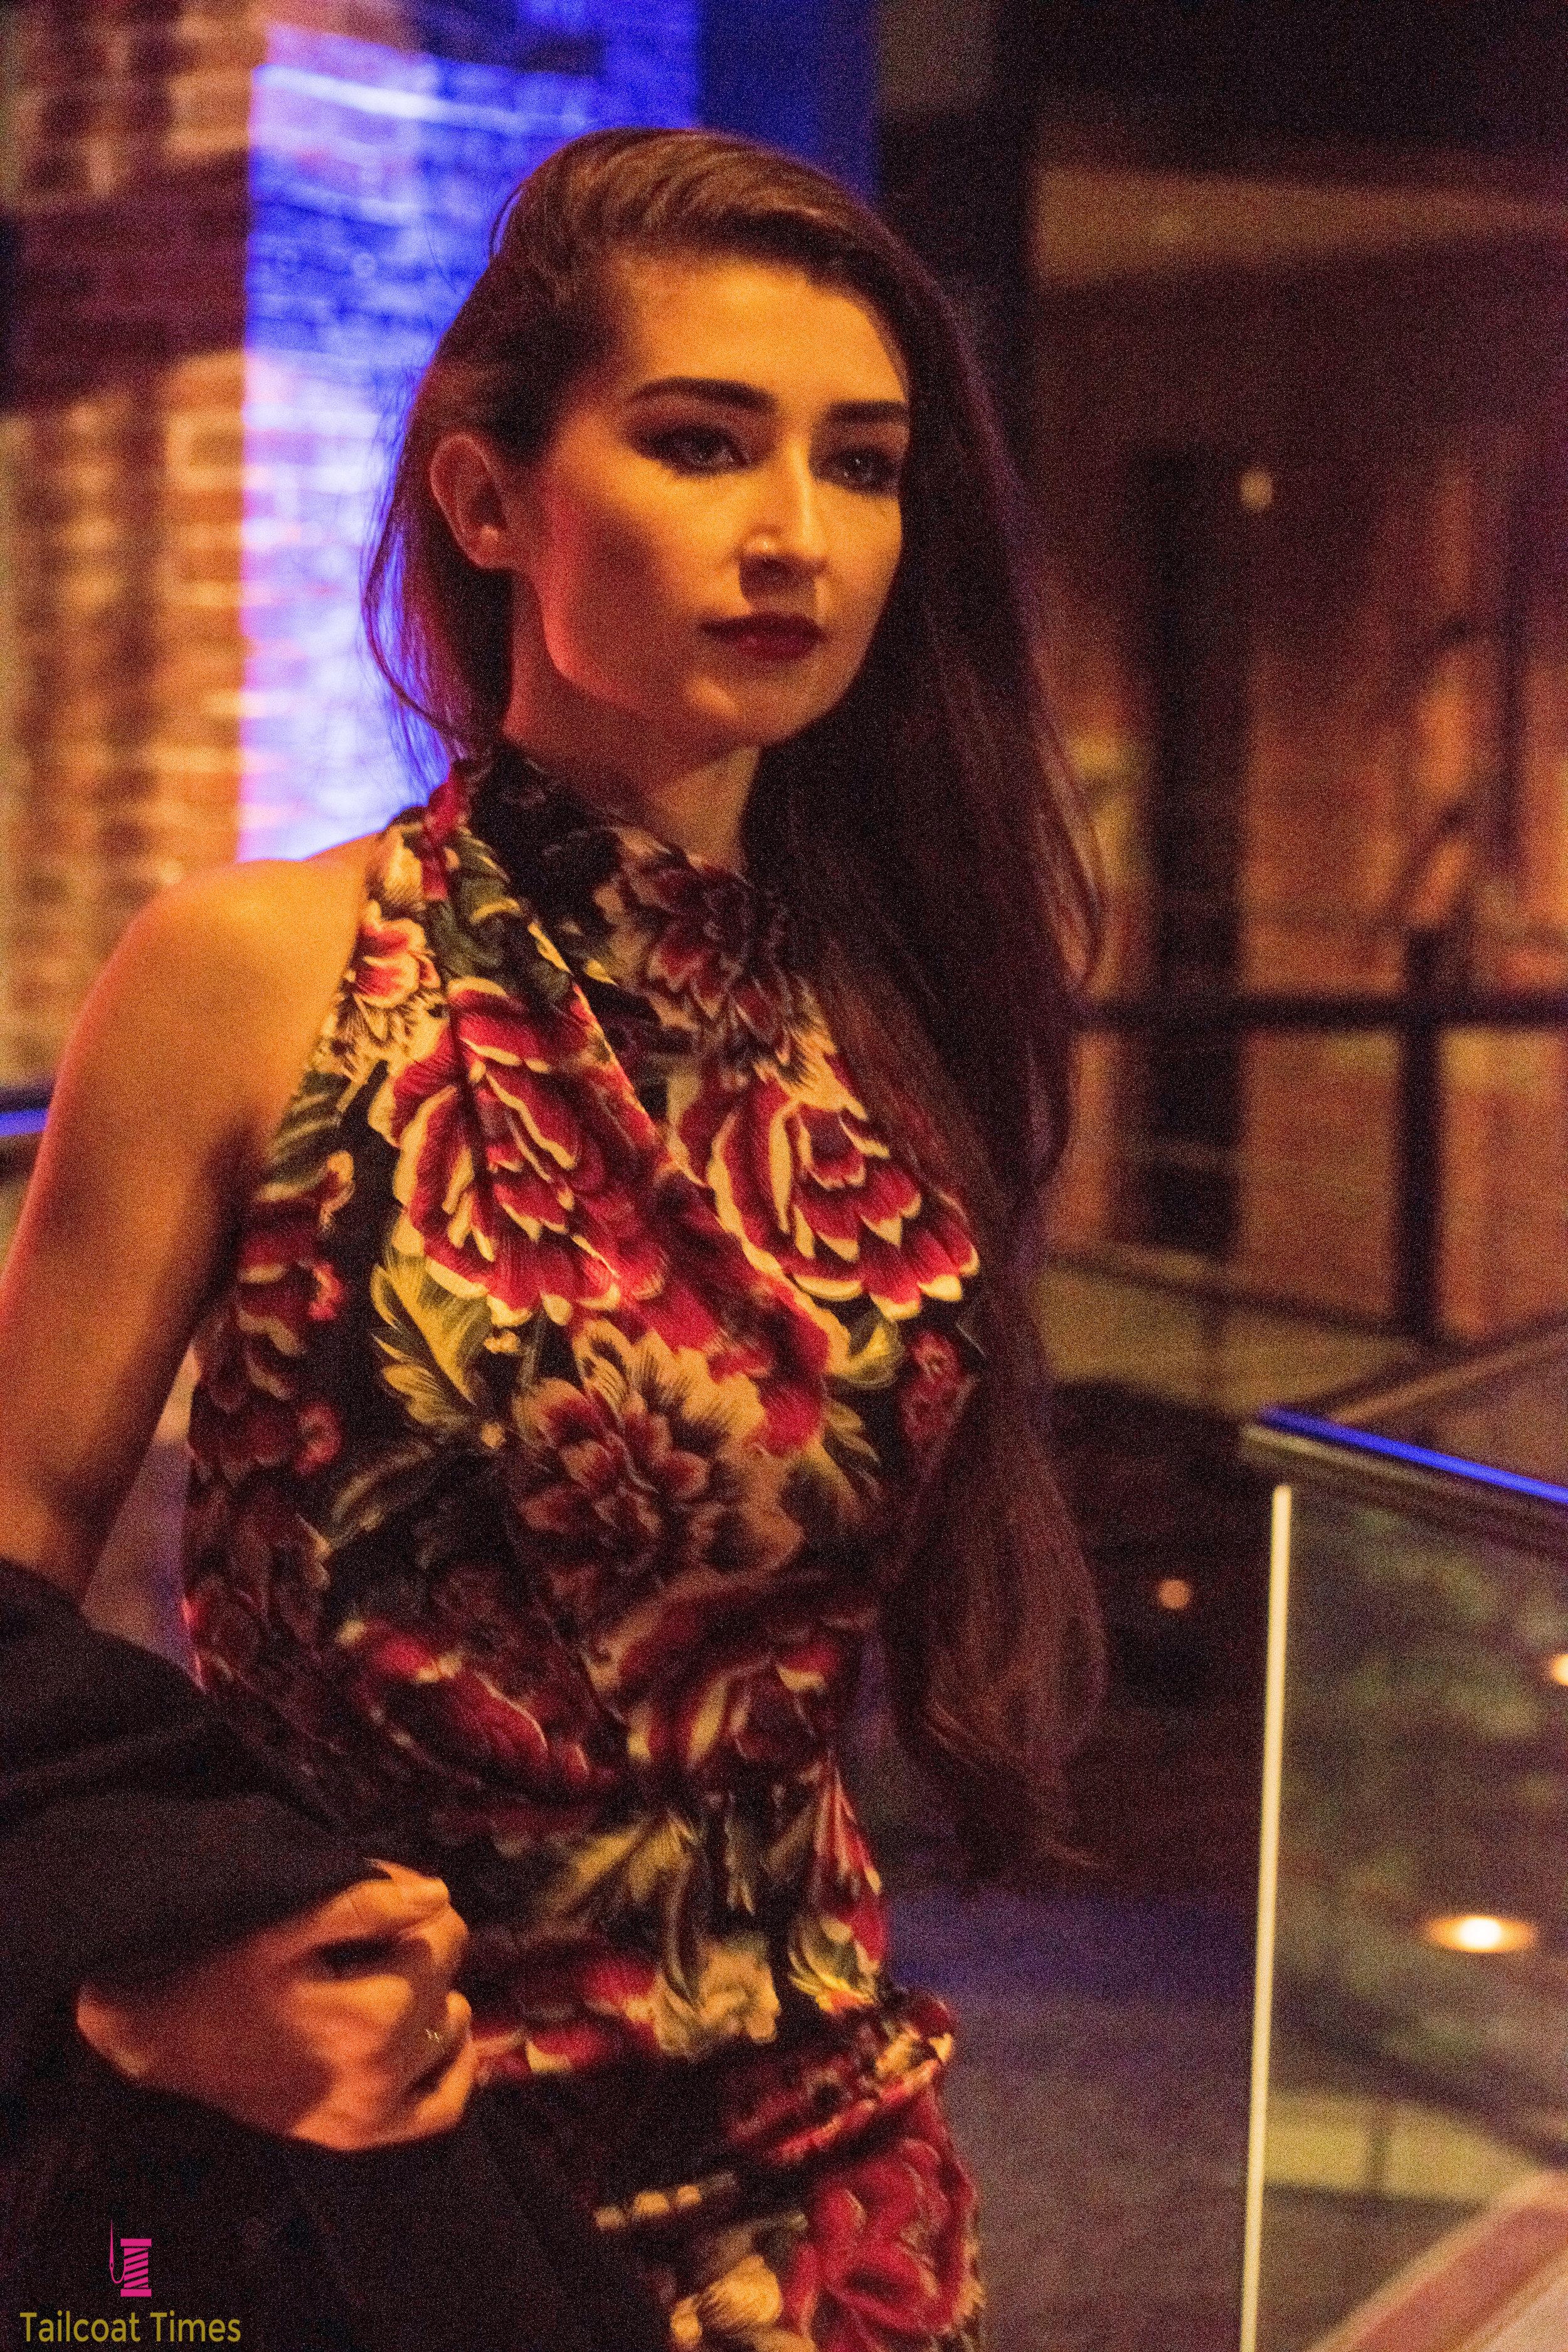 FashionablyLate-REISS-Tailcoat Times-17.jpg